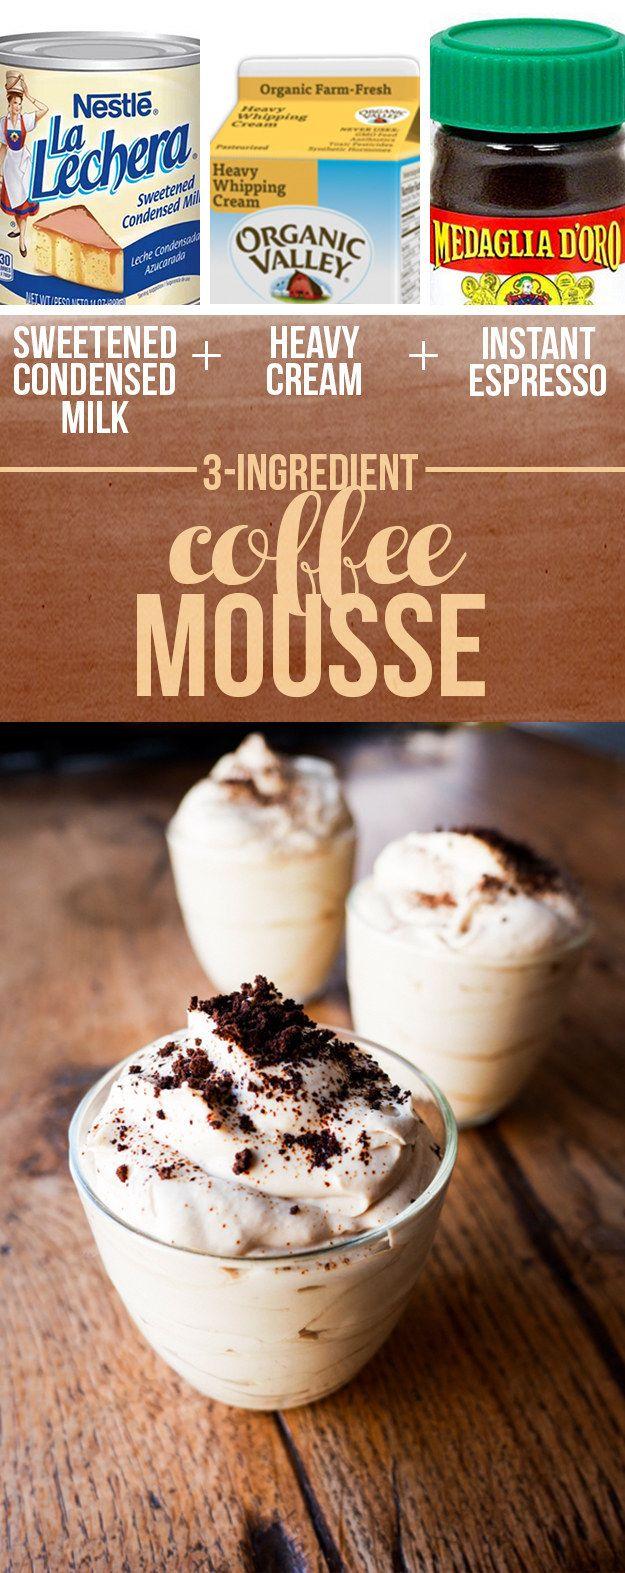 Sweetened Condensed Milk Heavy Cream Instant Espresso Coffee Mousse Coffee Mousse Desserts Dessert Ingredients